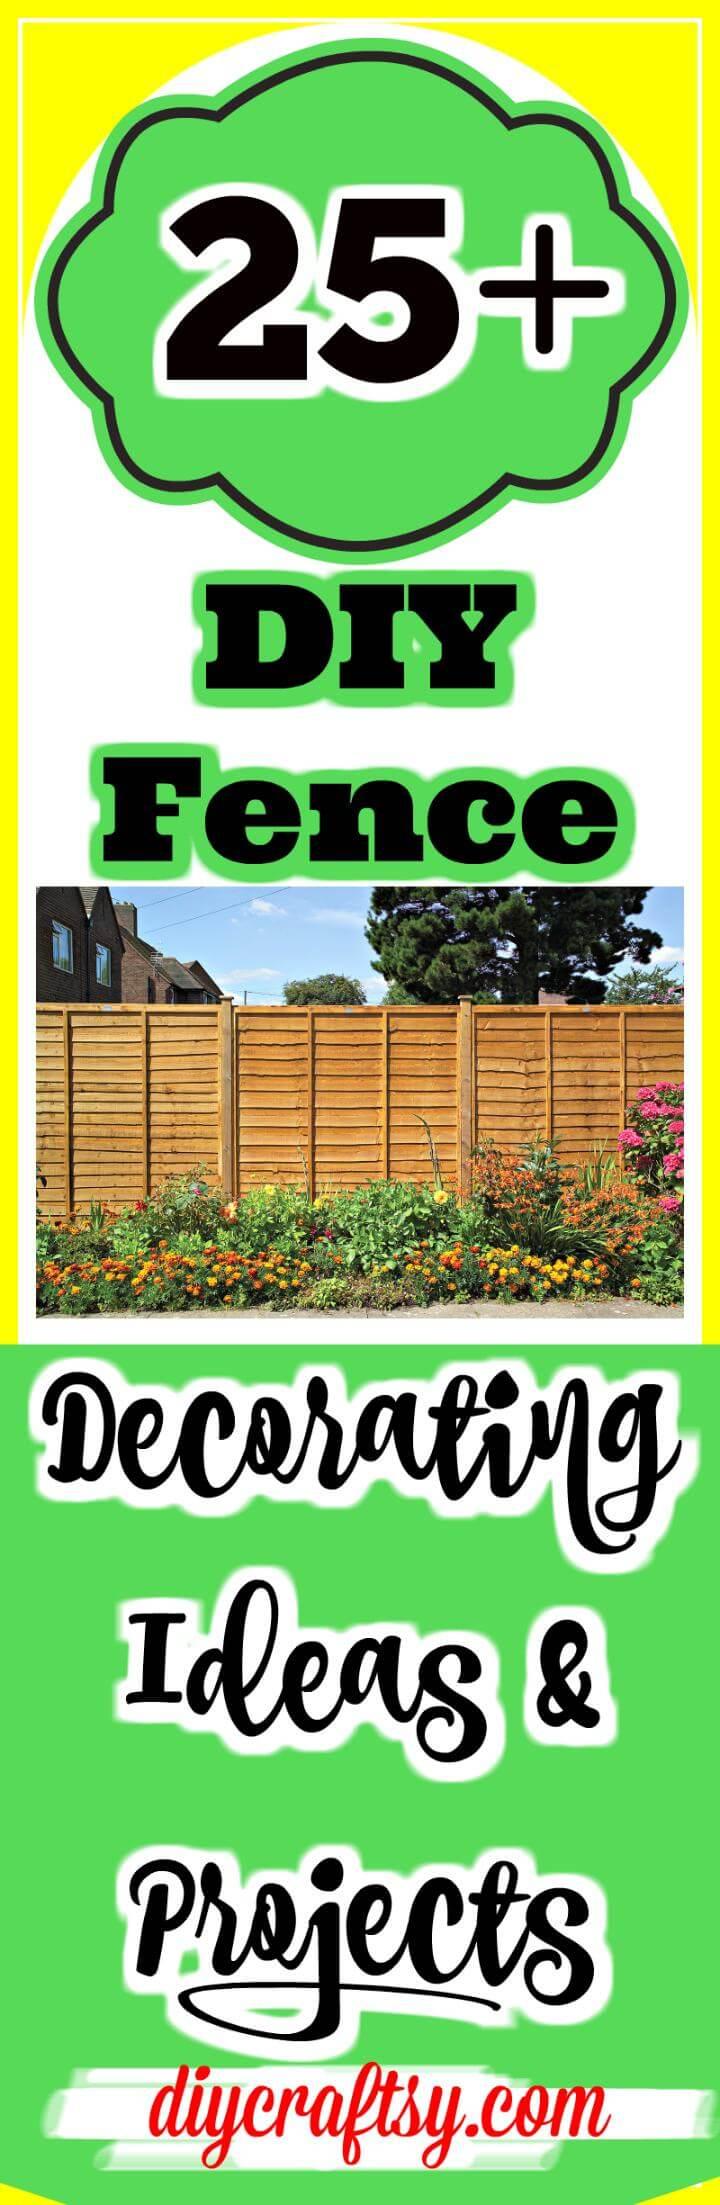 DIY Fence Decorating Ideas